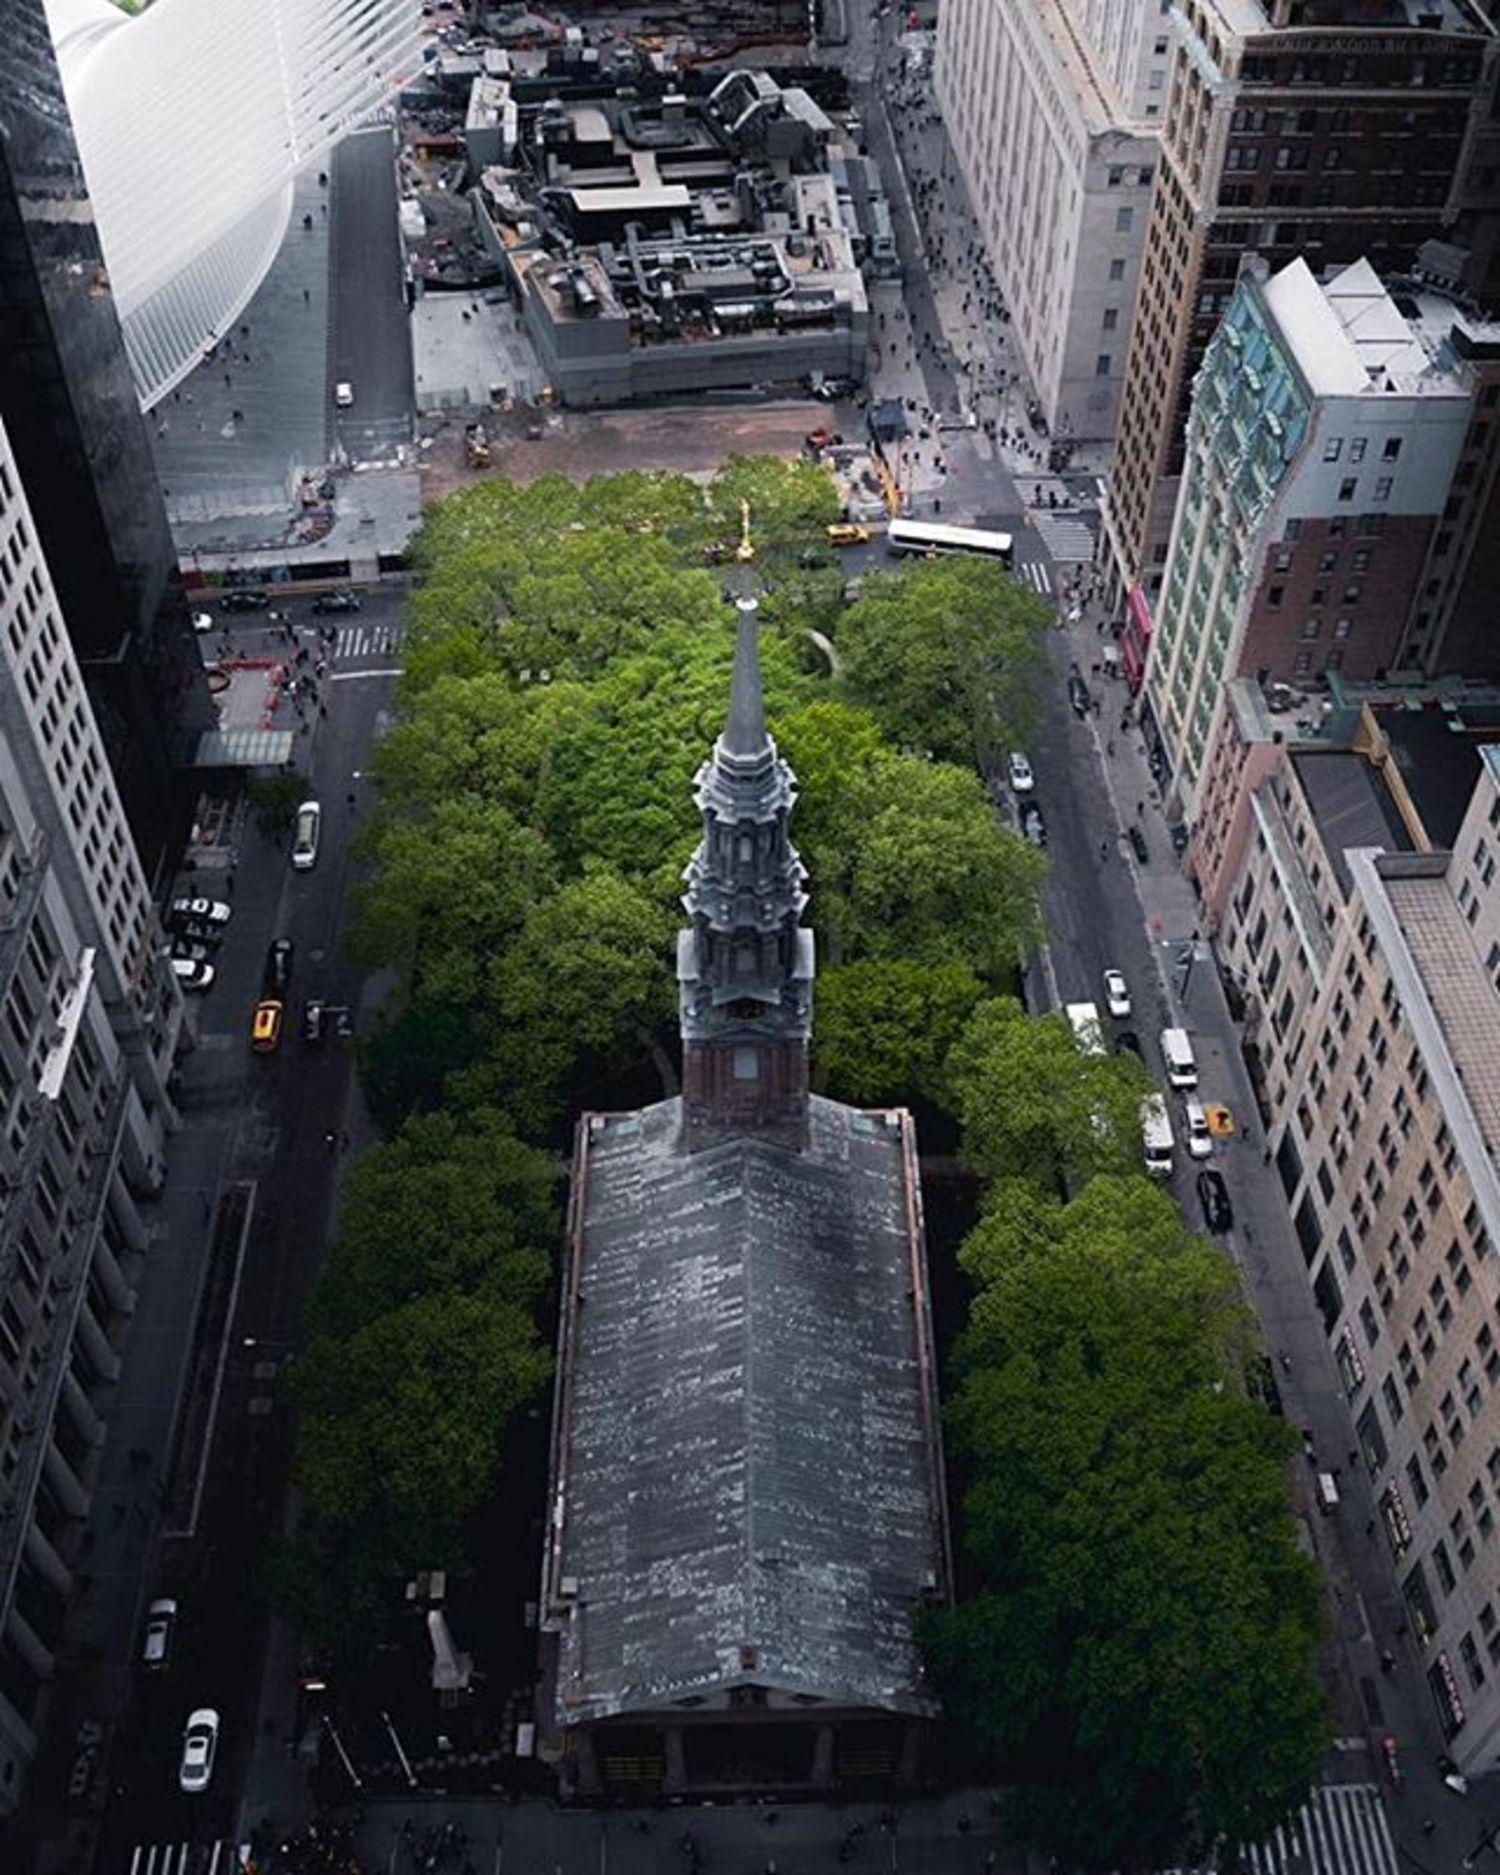 St. Paul's Chapel, New York, New York. Photo via @urbnxplrtn #viewingnyc #newyorkcity #newyork